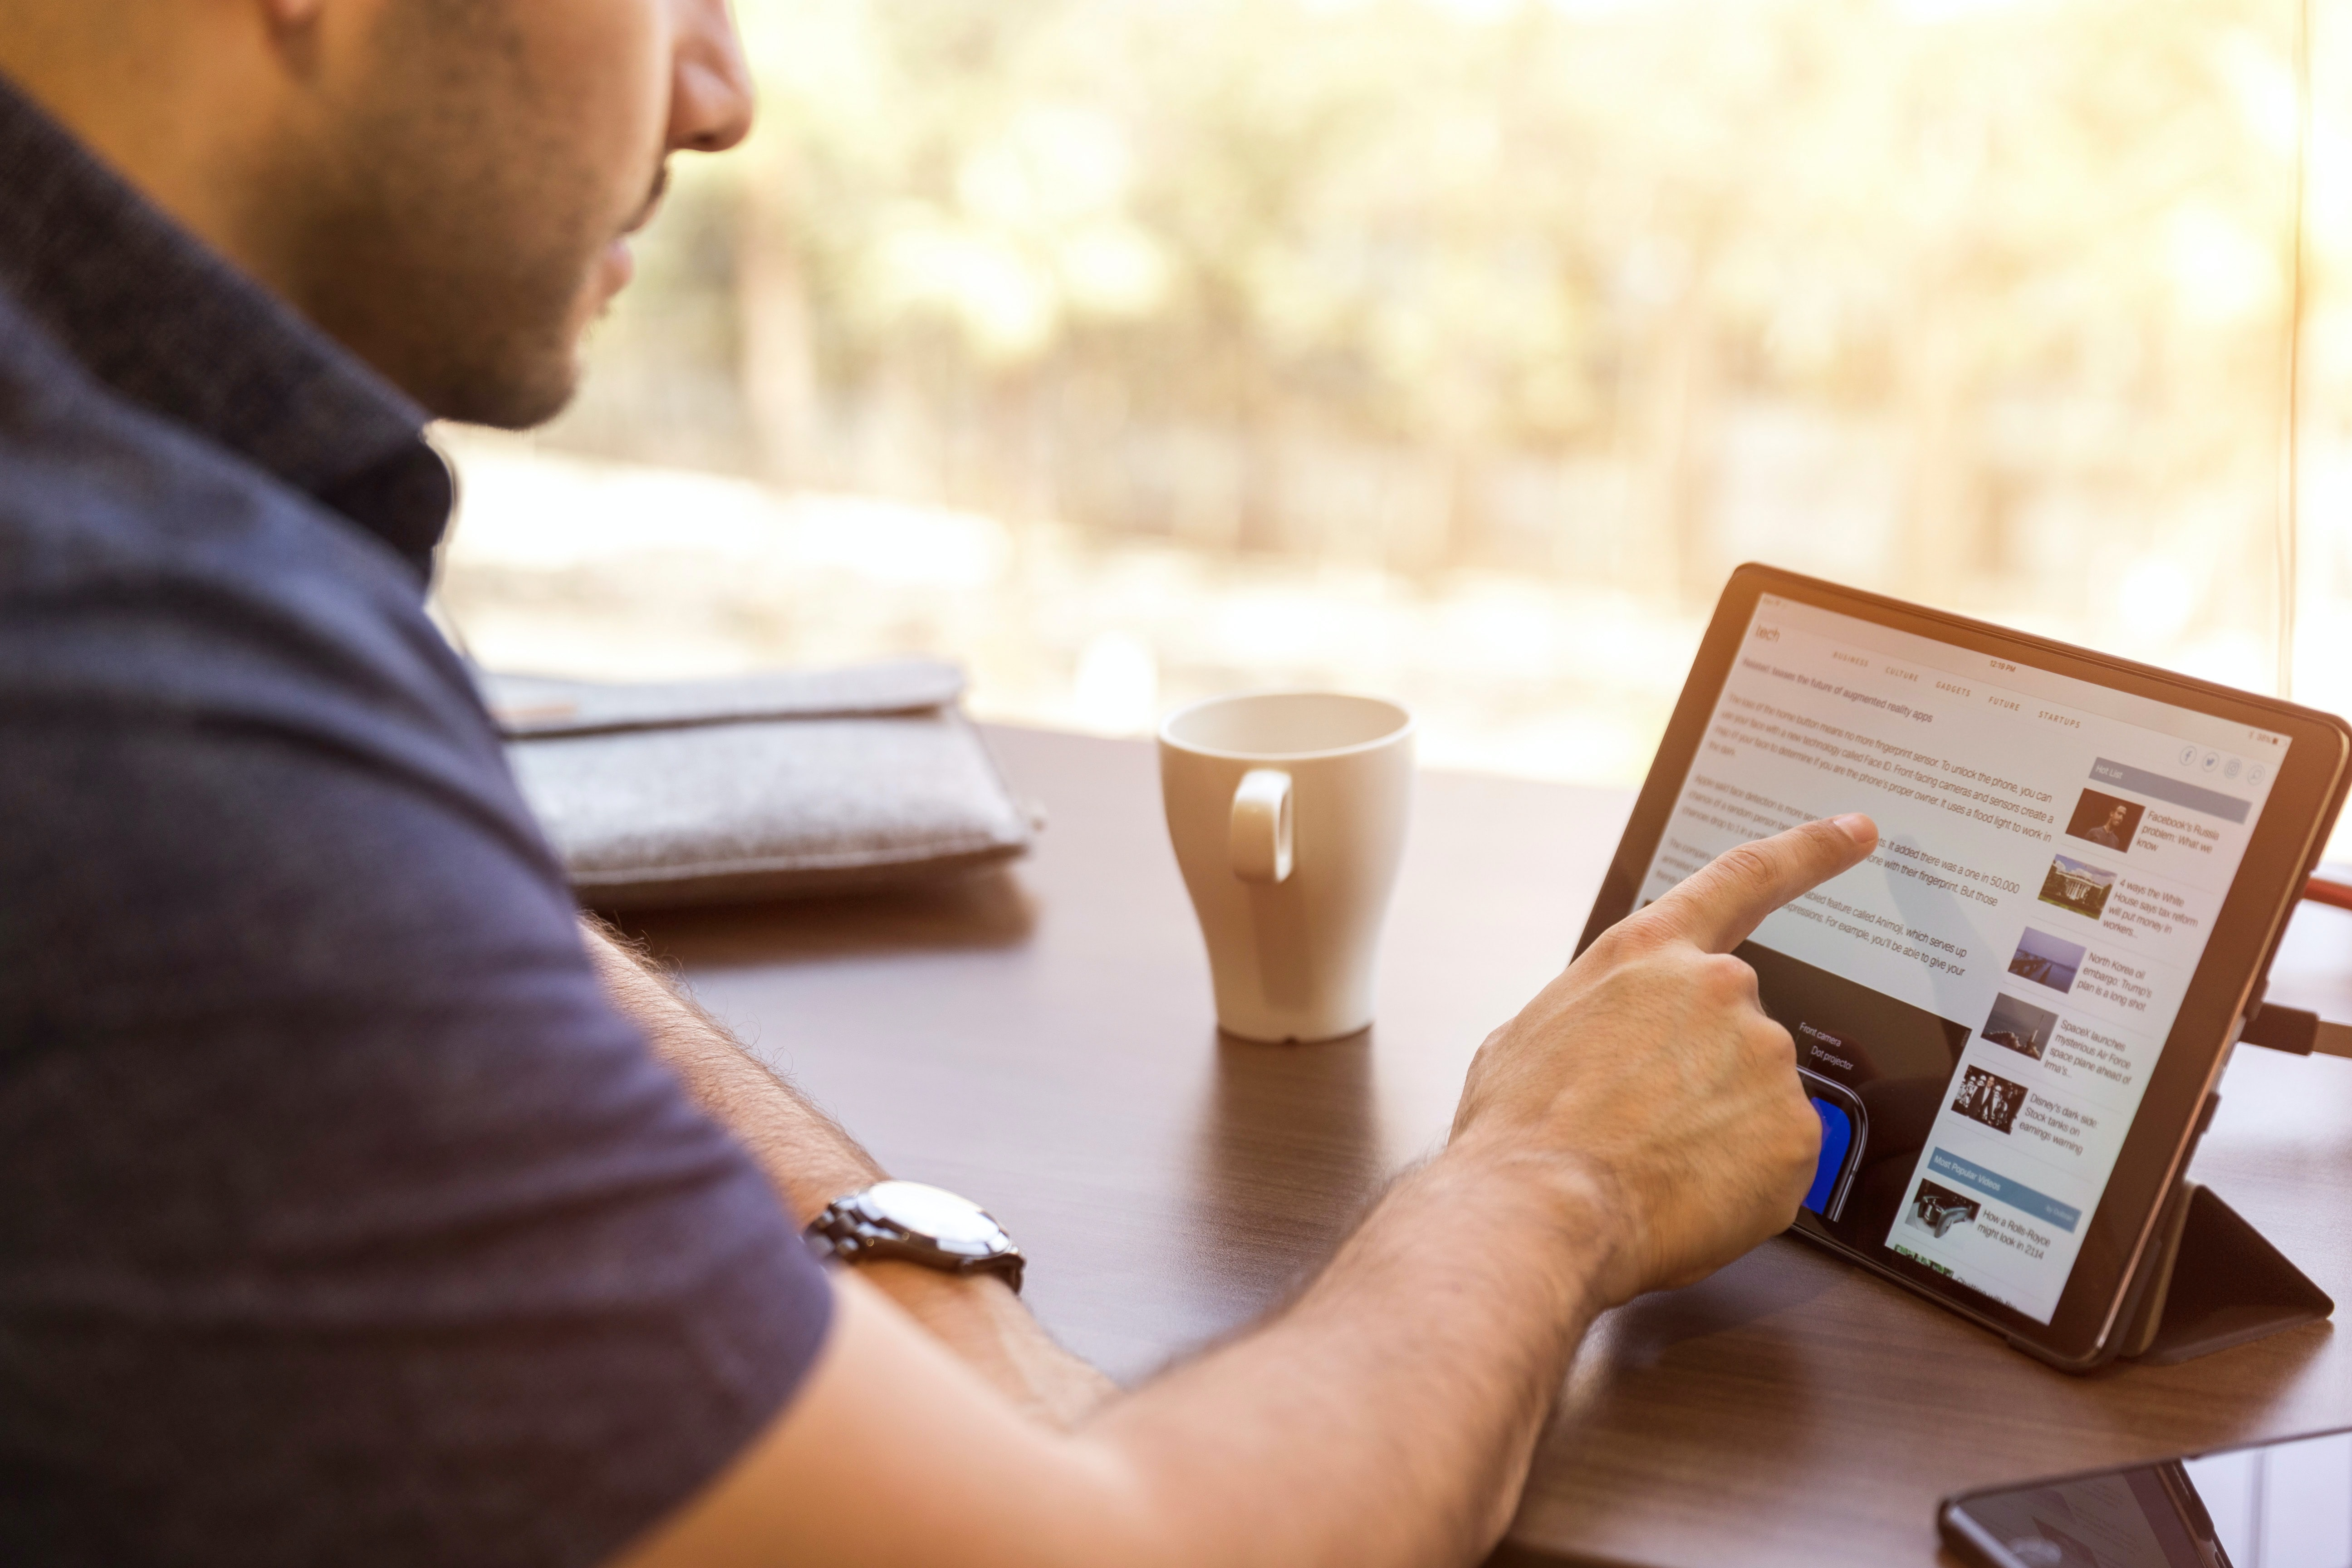 %Top Digital Marketing Experts In Hamilton%Okoye Consultants